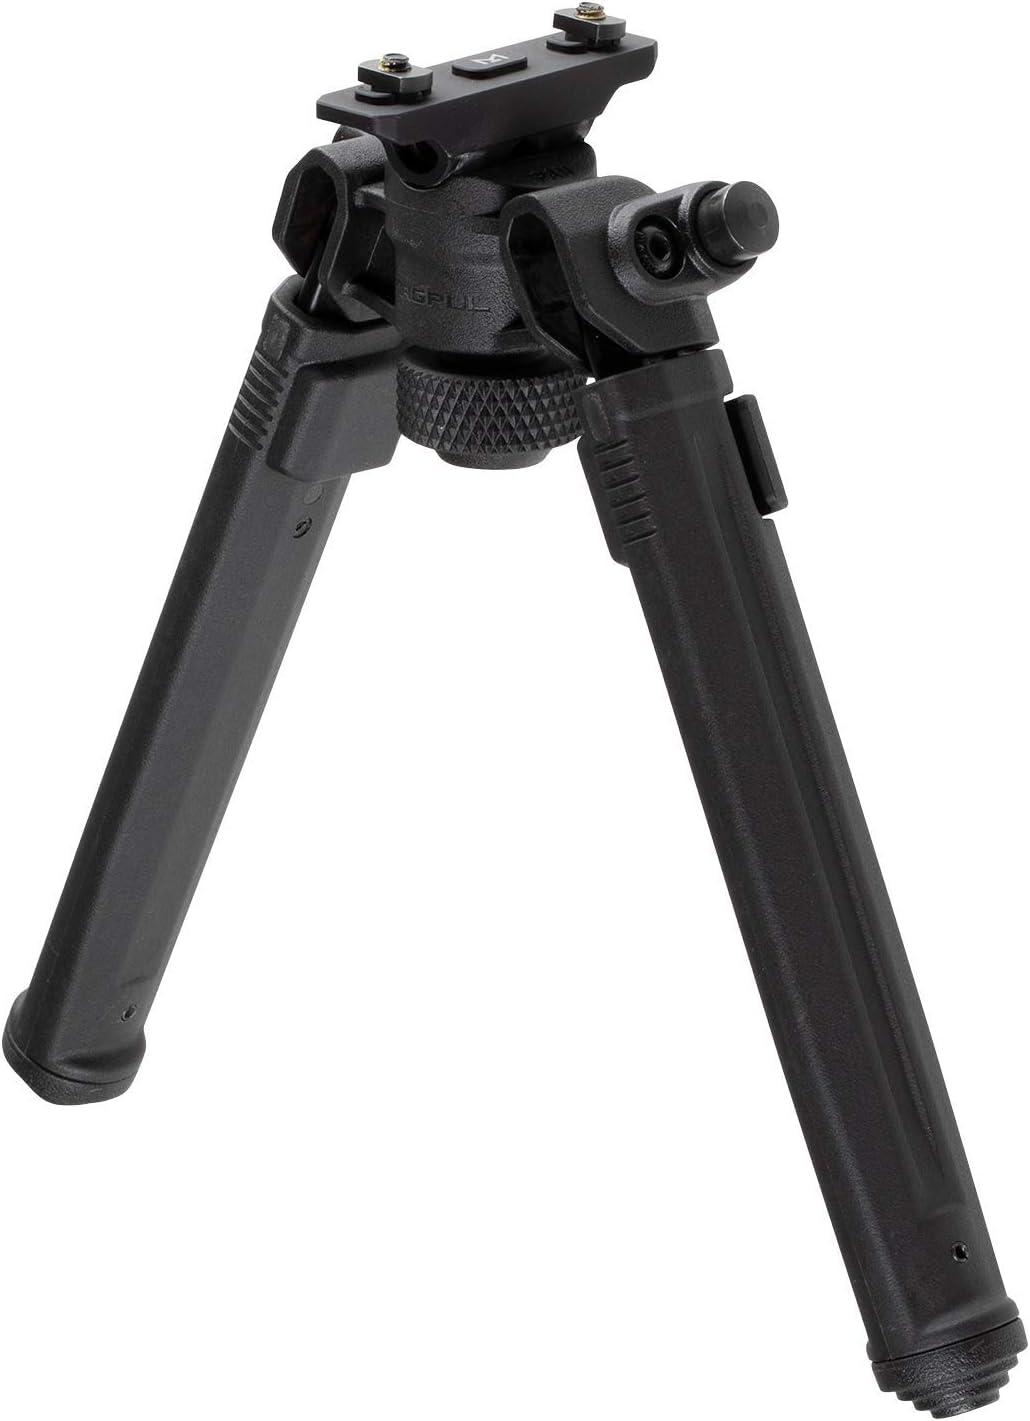 <strong>Magpul Rifle Bipod</strong>}